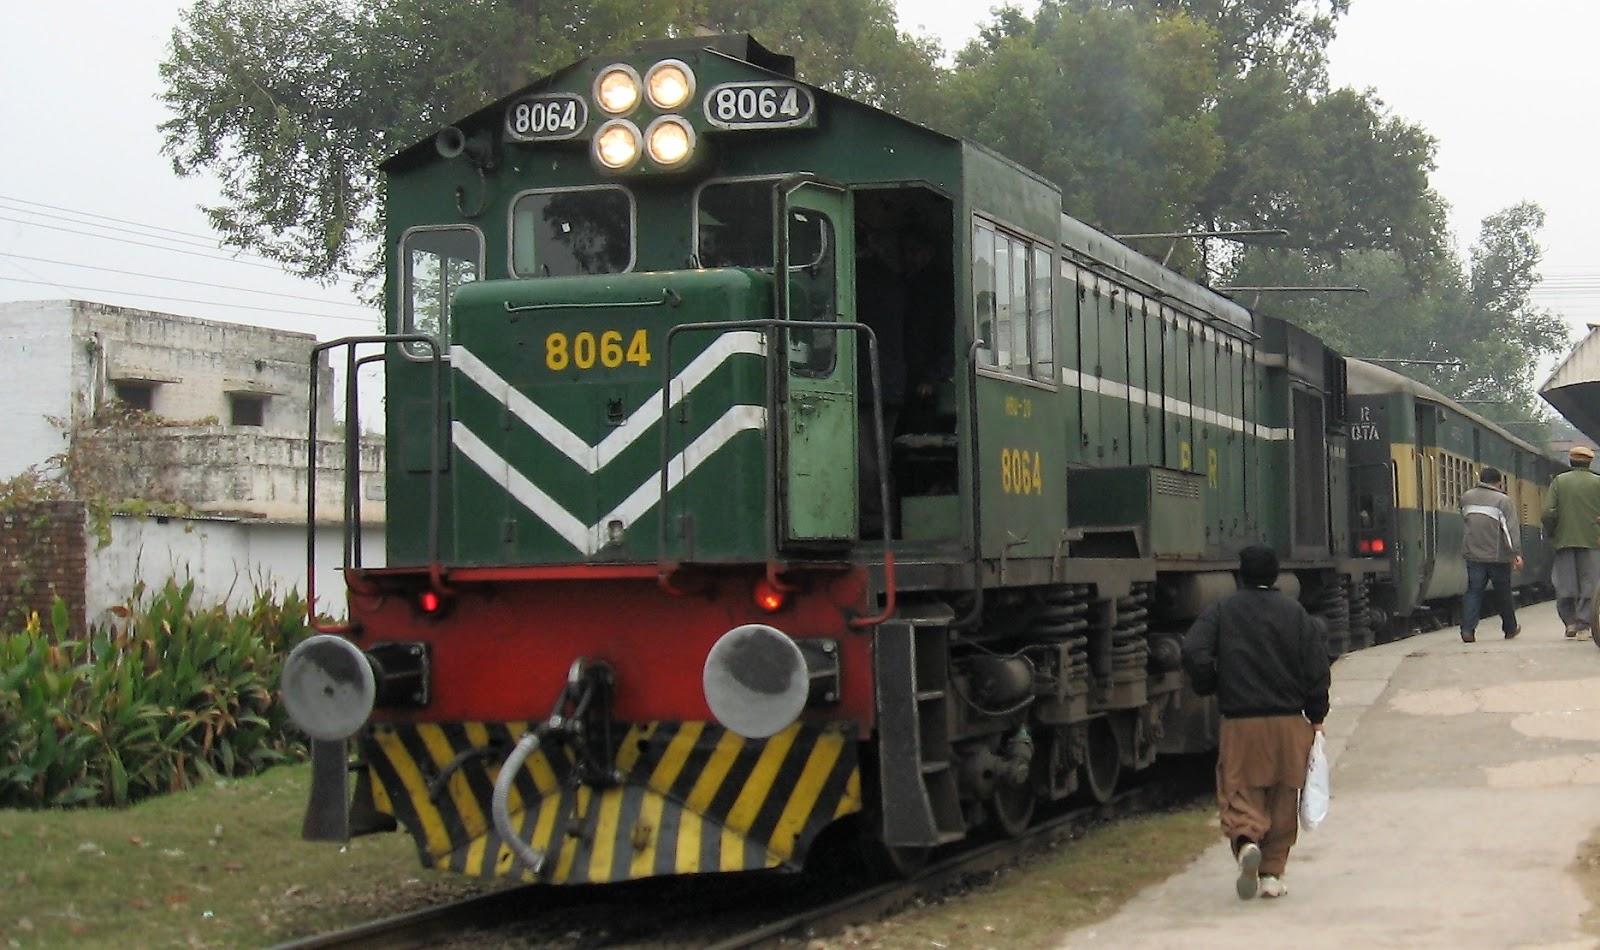 Railways Minister Launches High-Speed 'Rahman Baba Express' Train